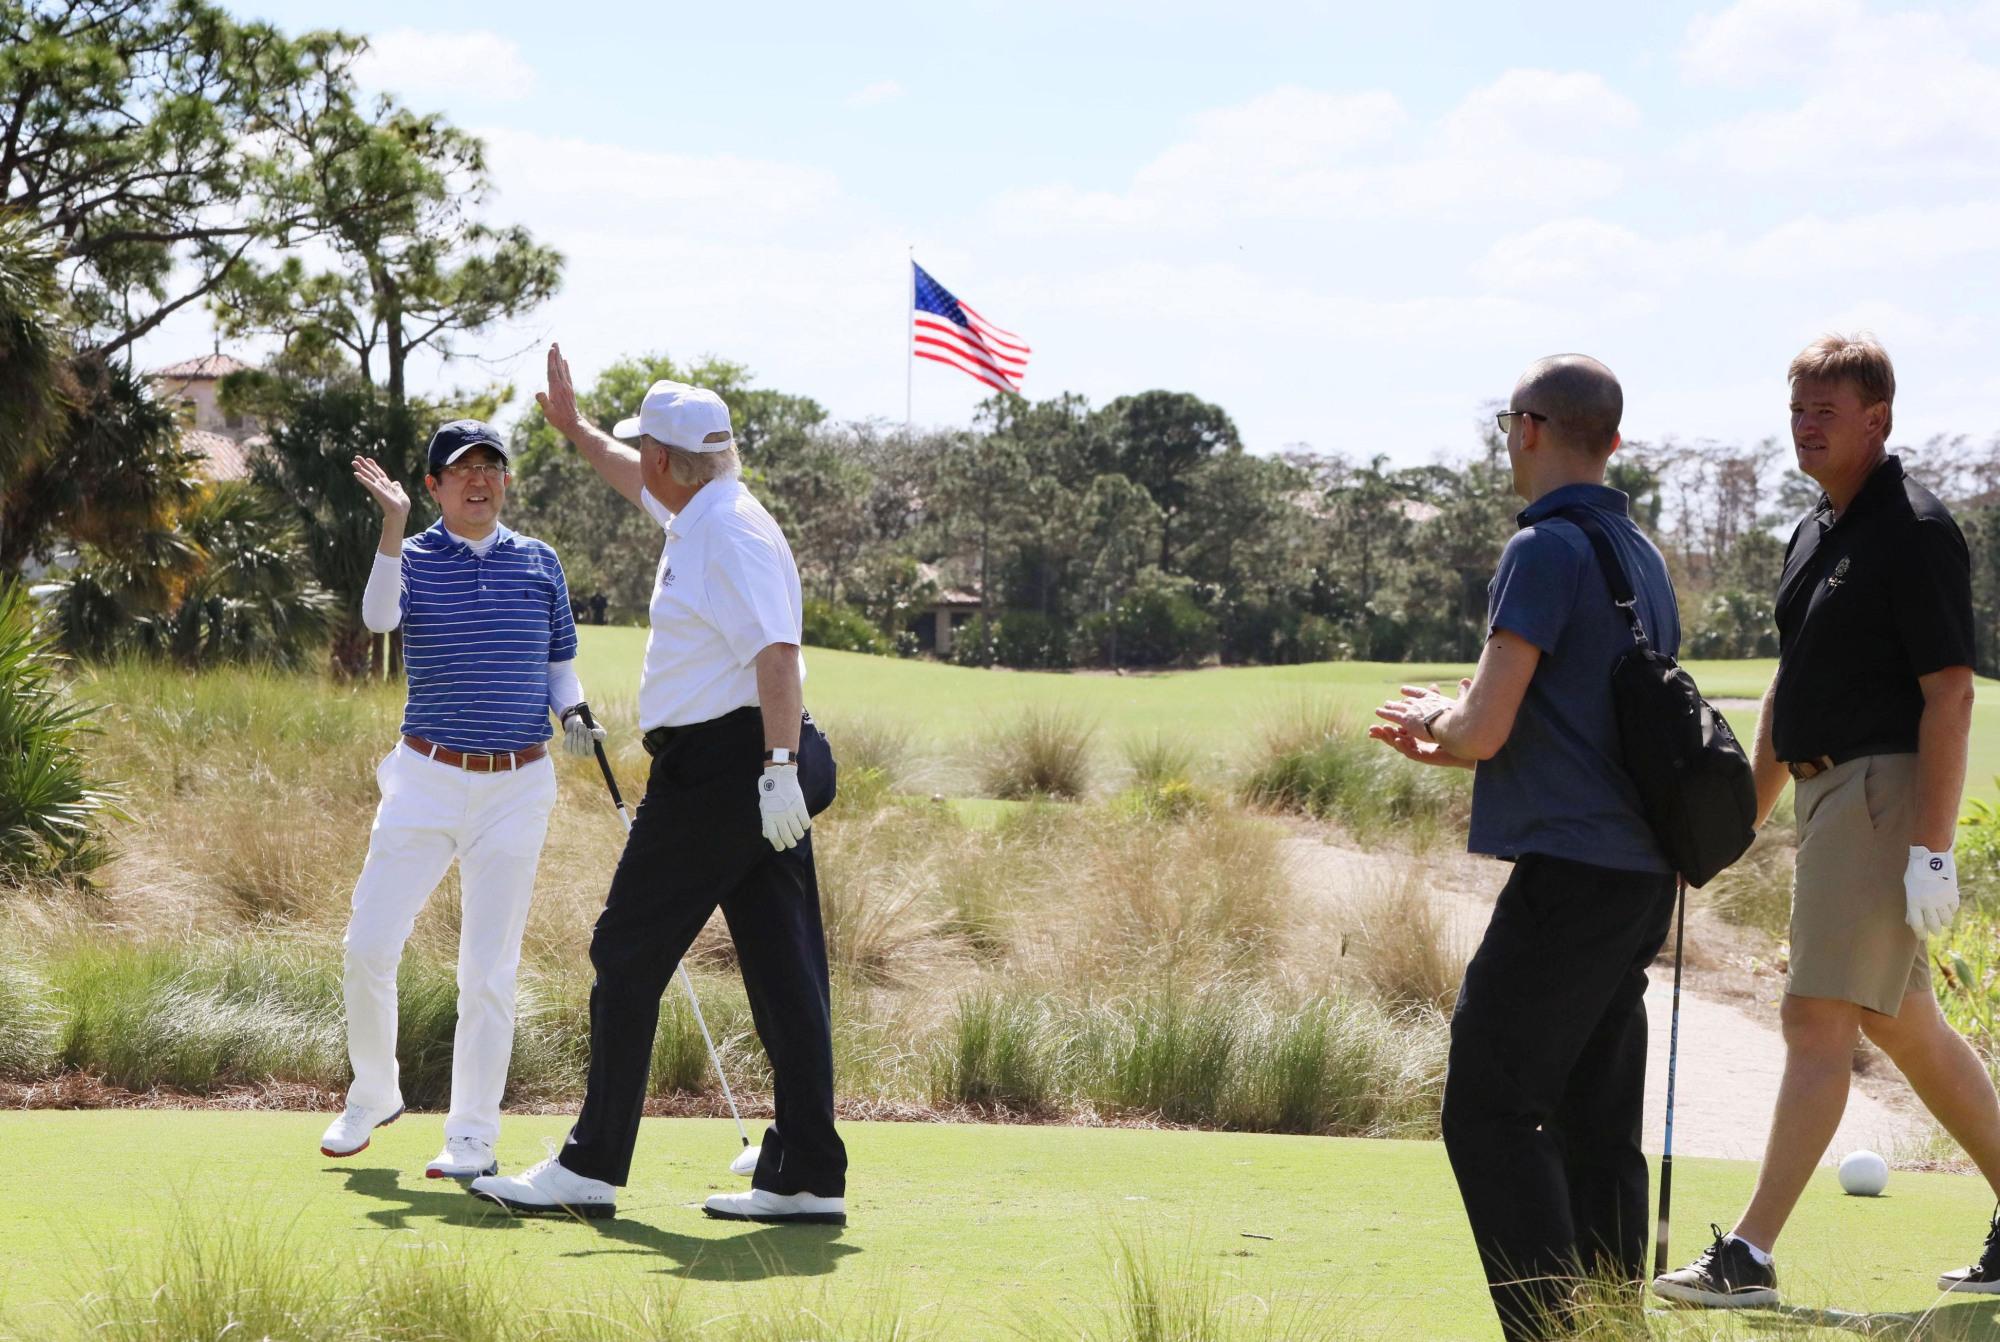 Abe gioca a golf con Trump e cade